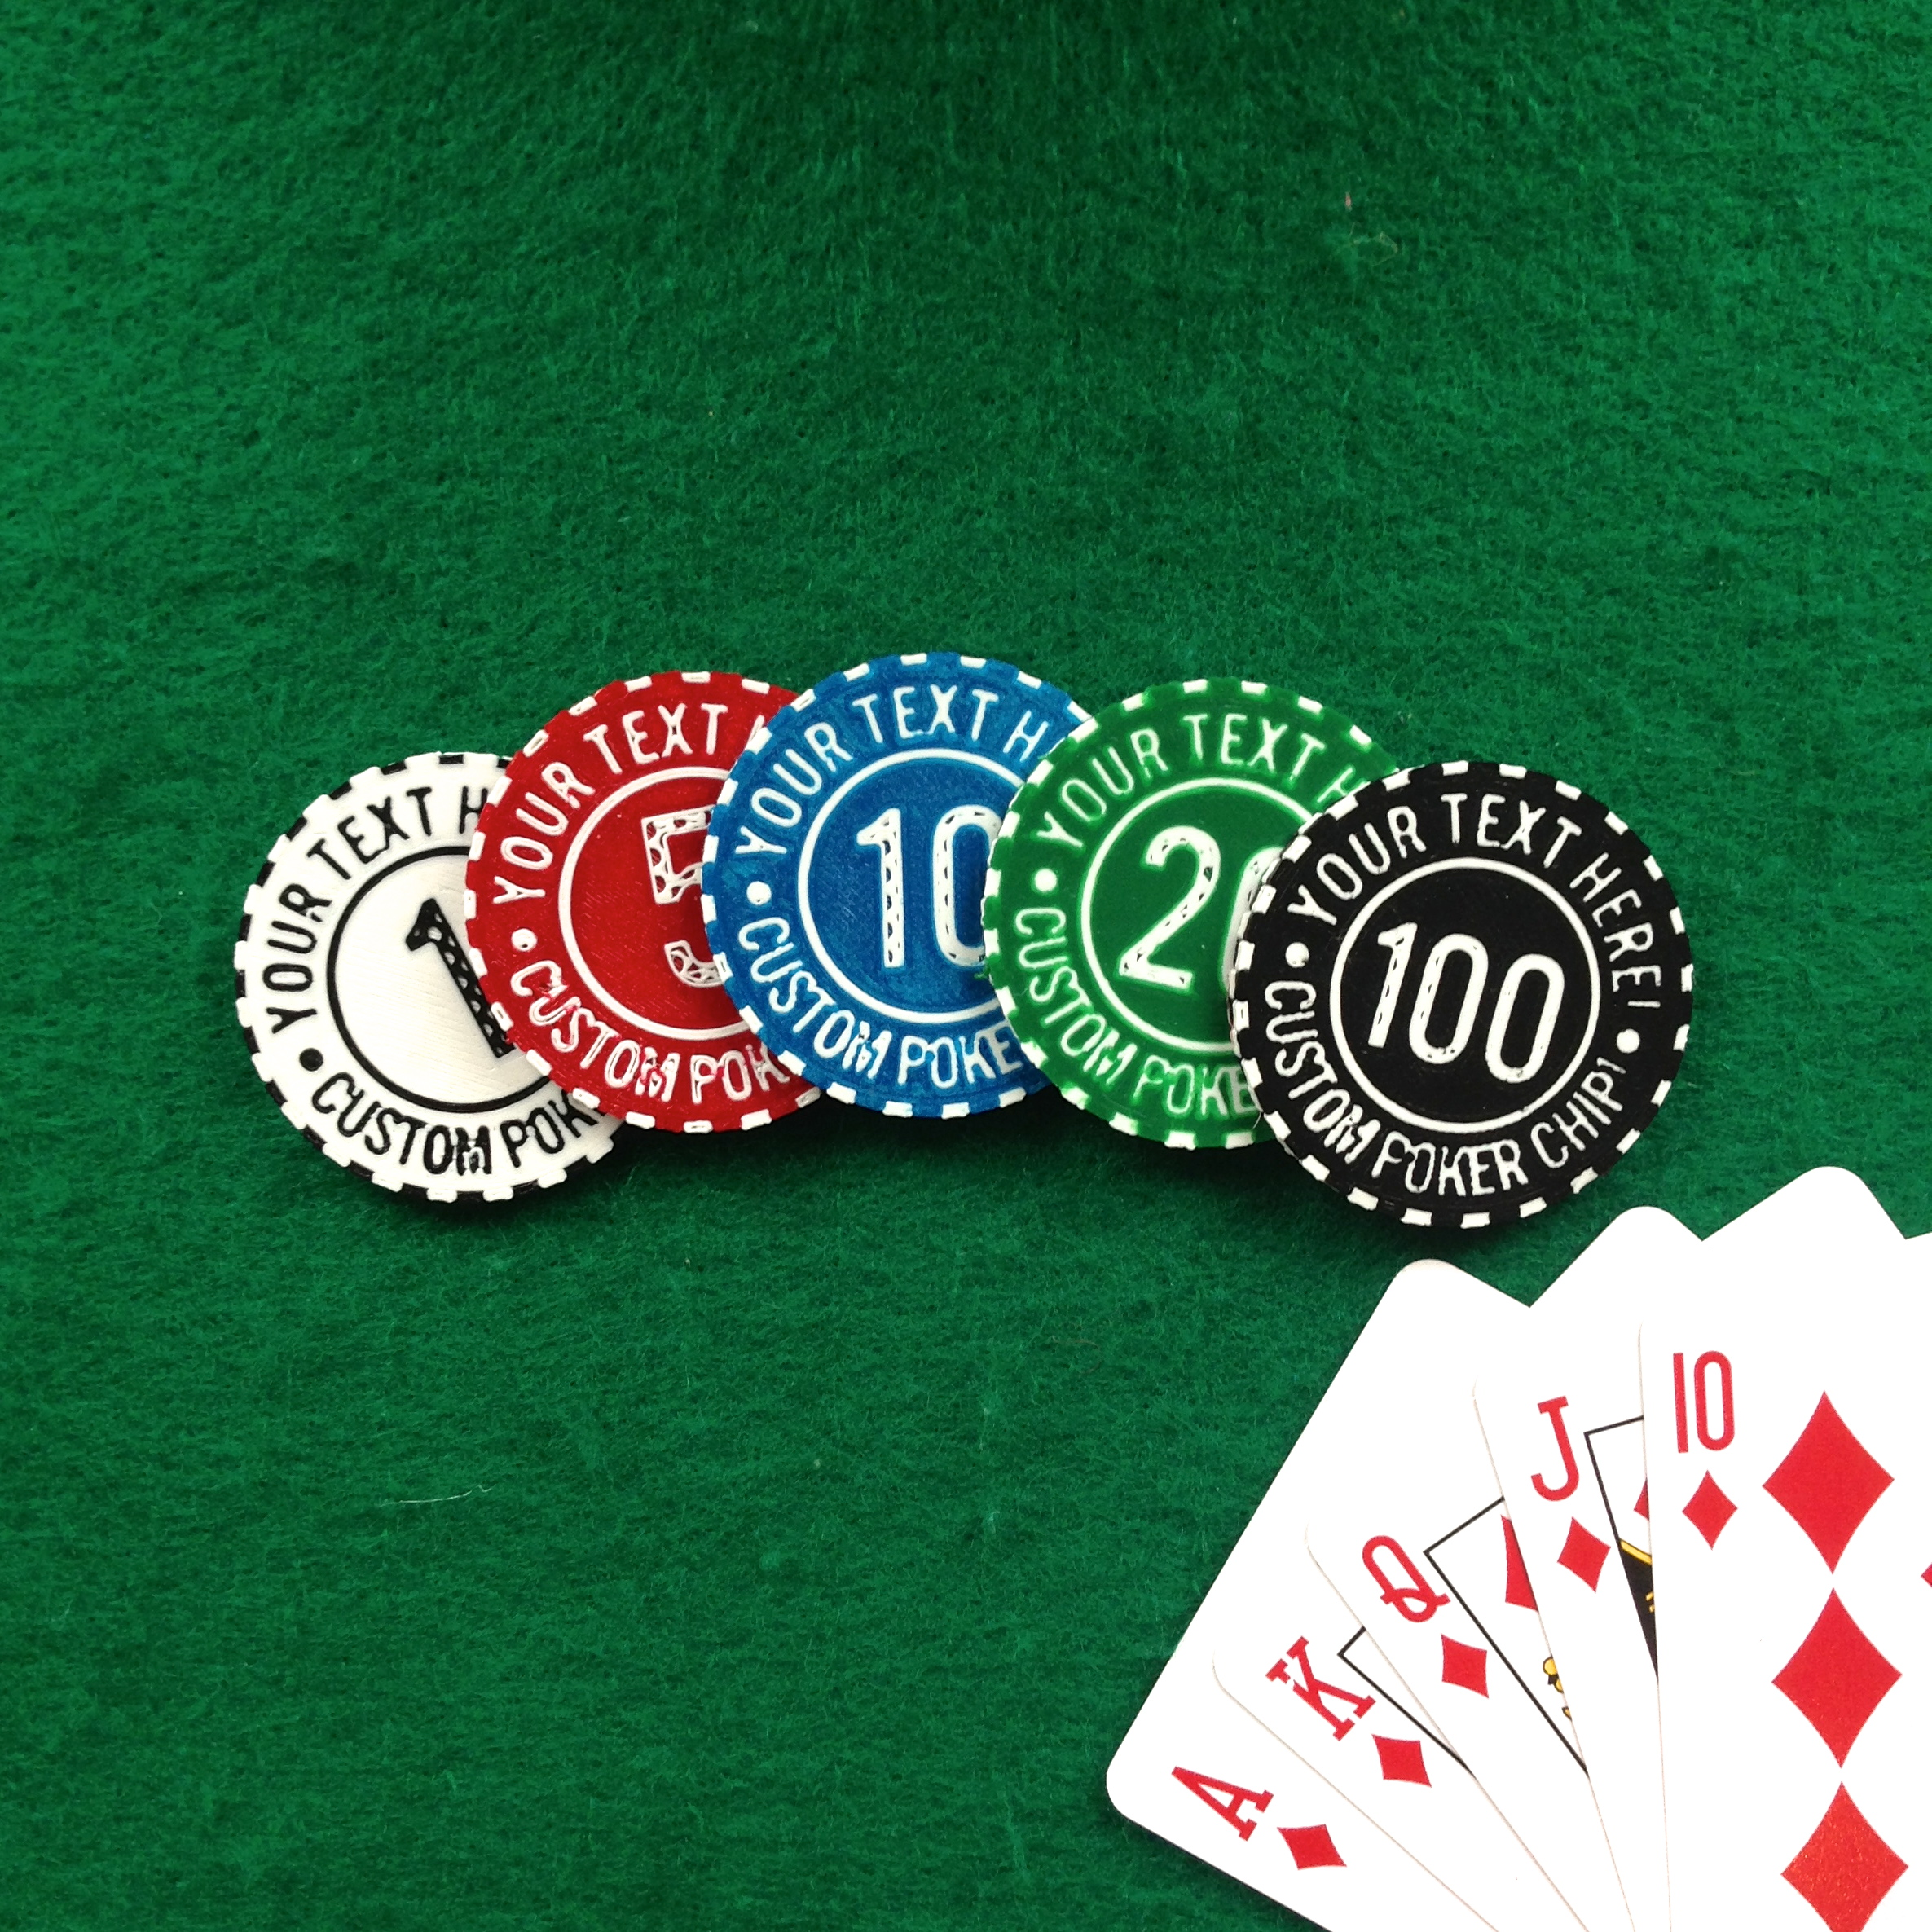 Coolest Poker Chips